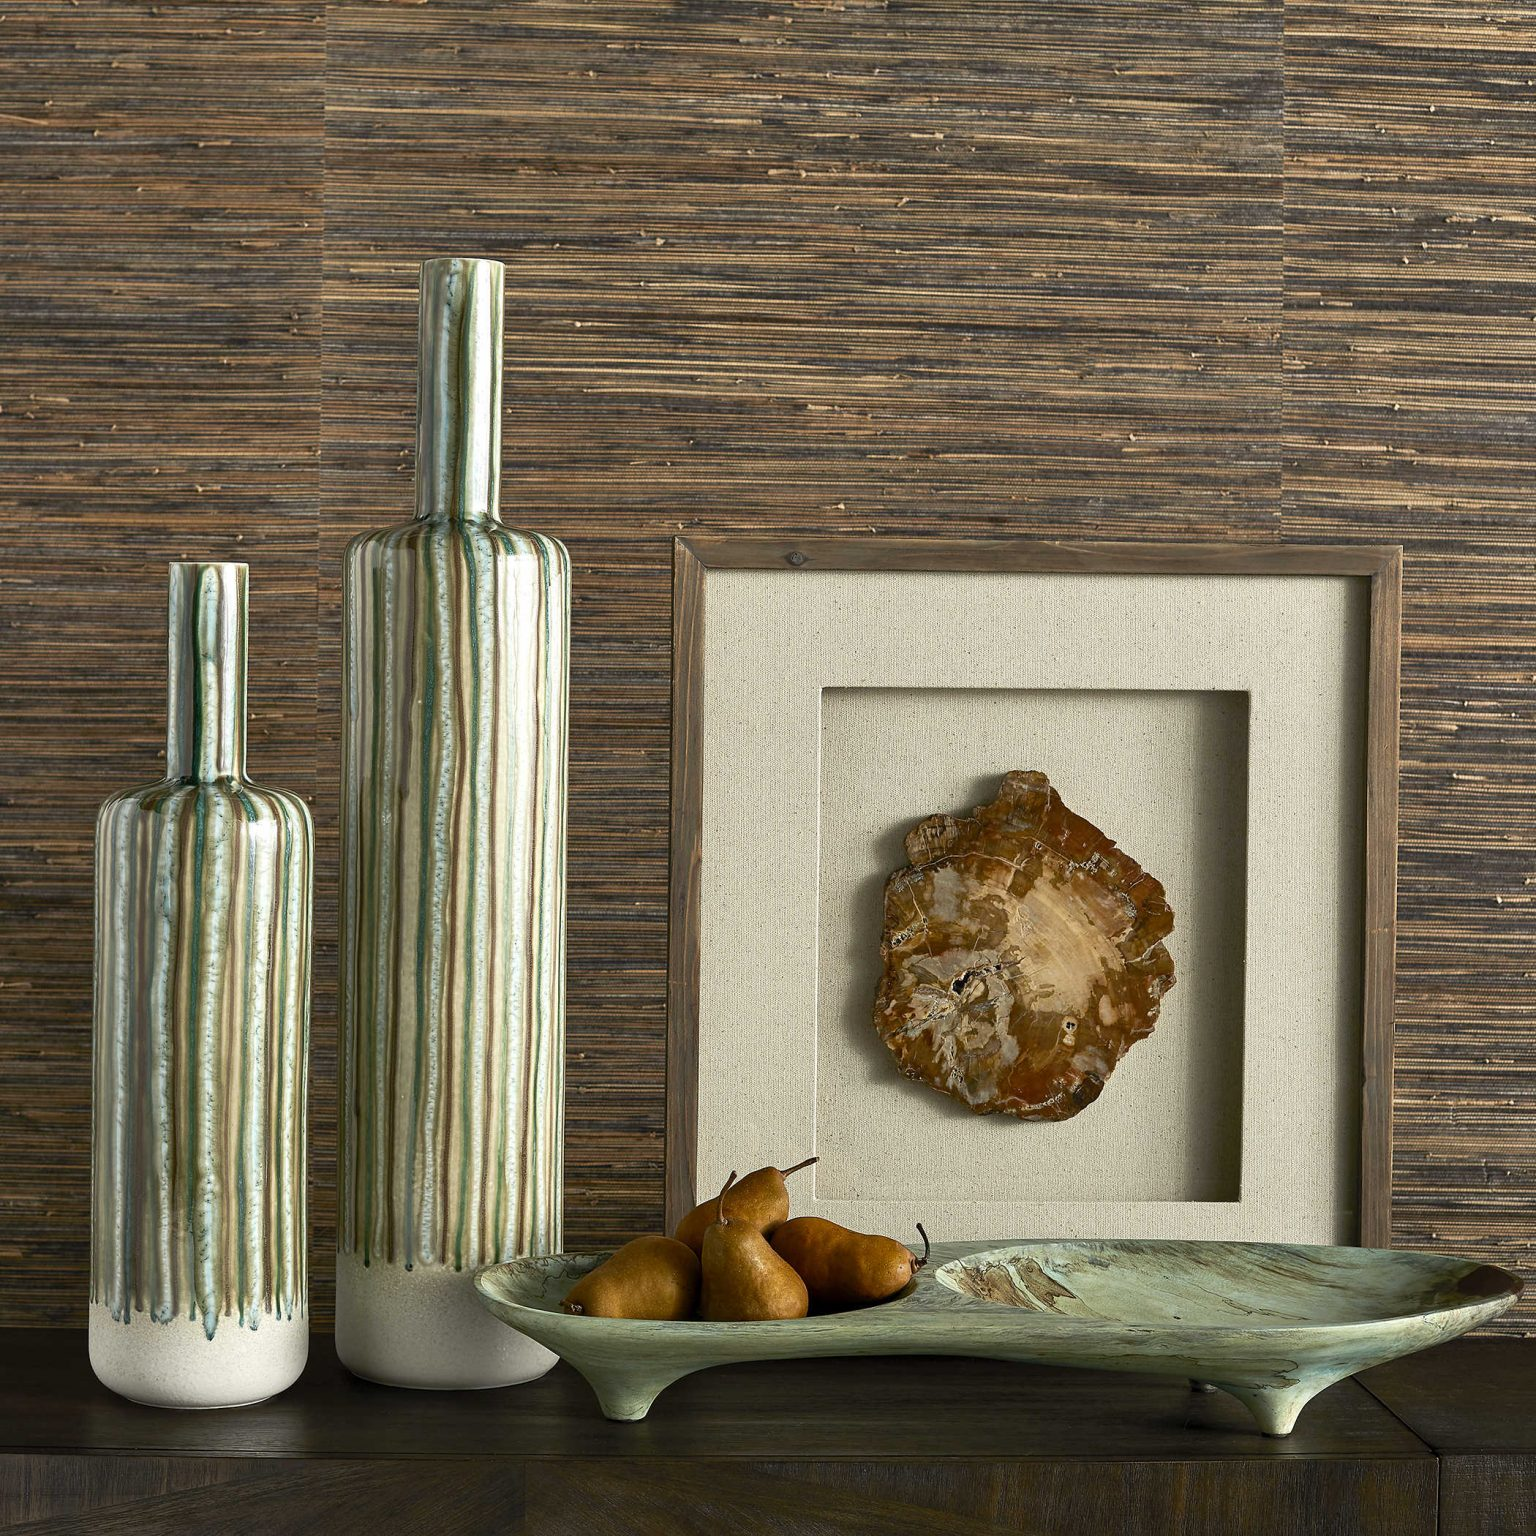 Ceramic bottles with petrified wood